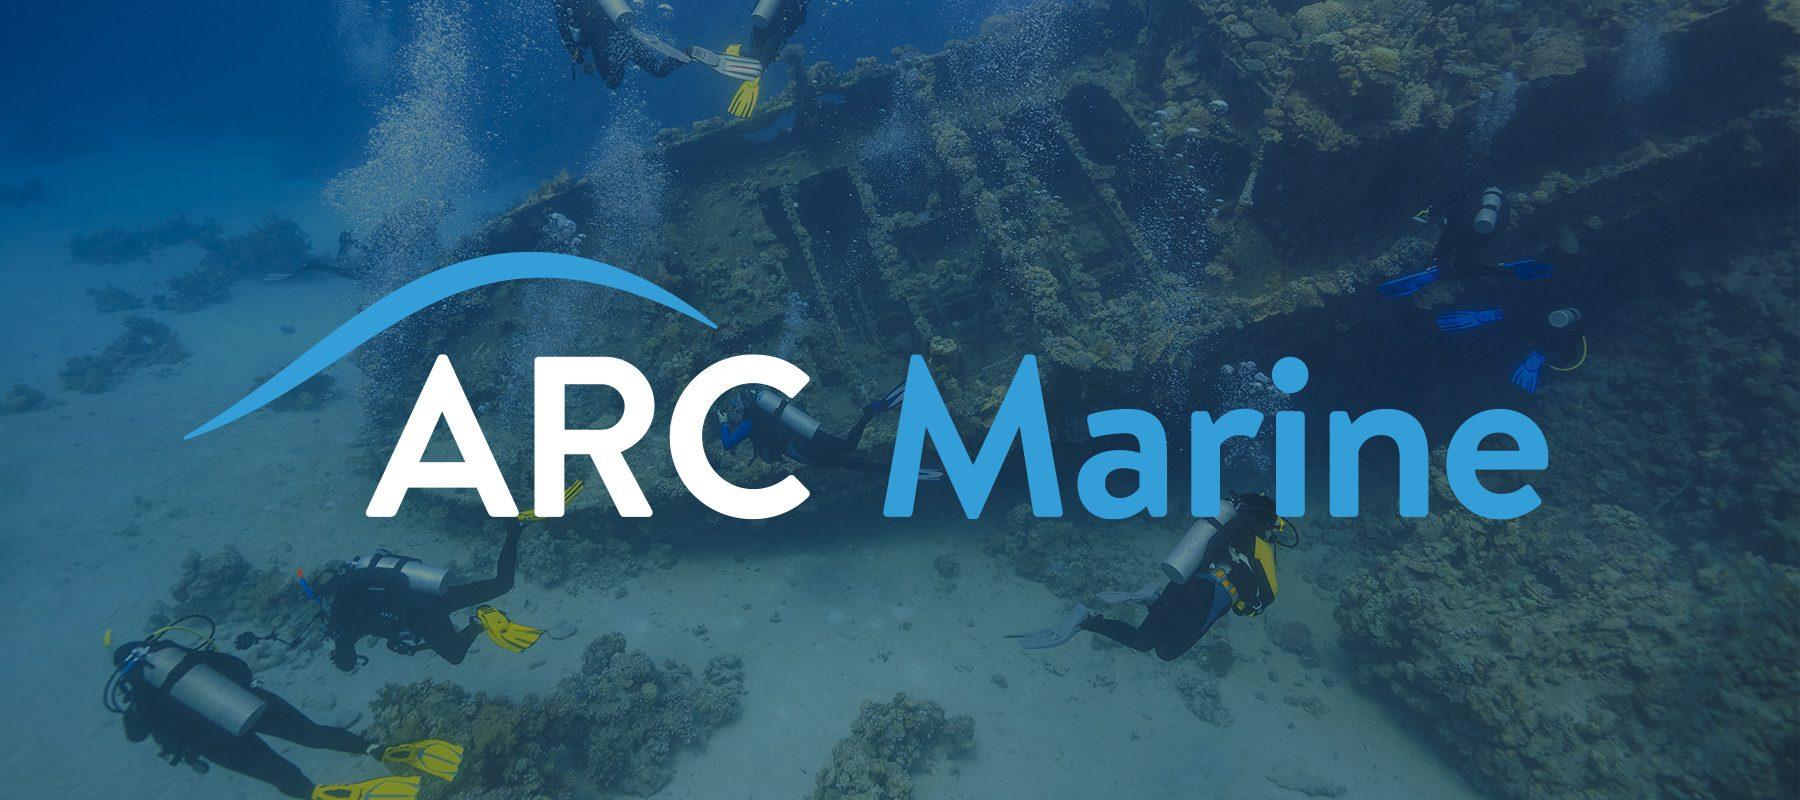 arc marine reef conservation virgin start up brand logo website design